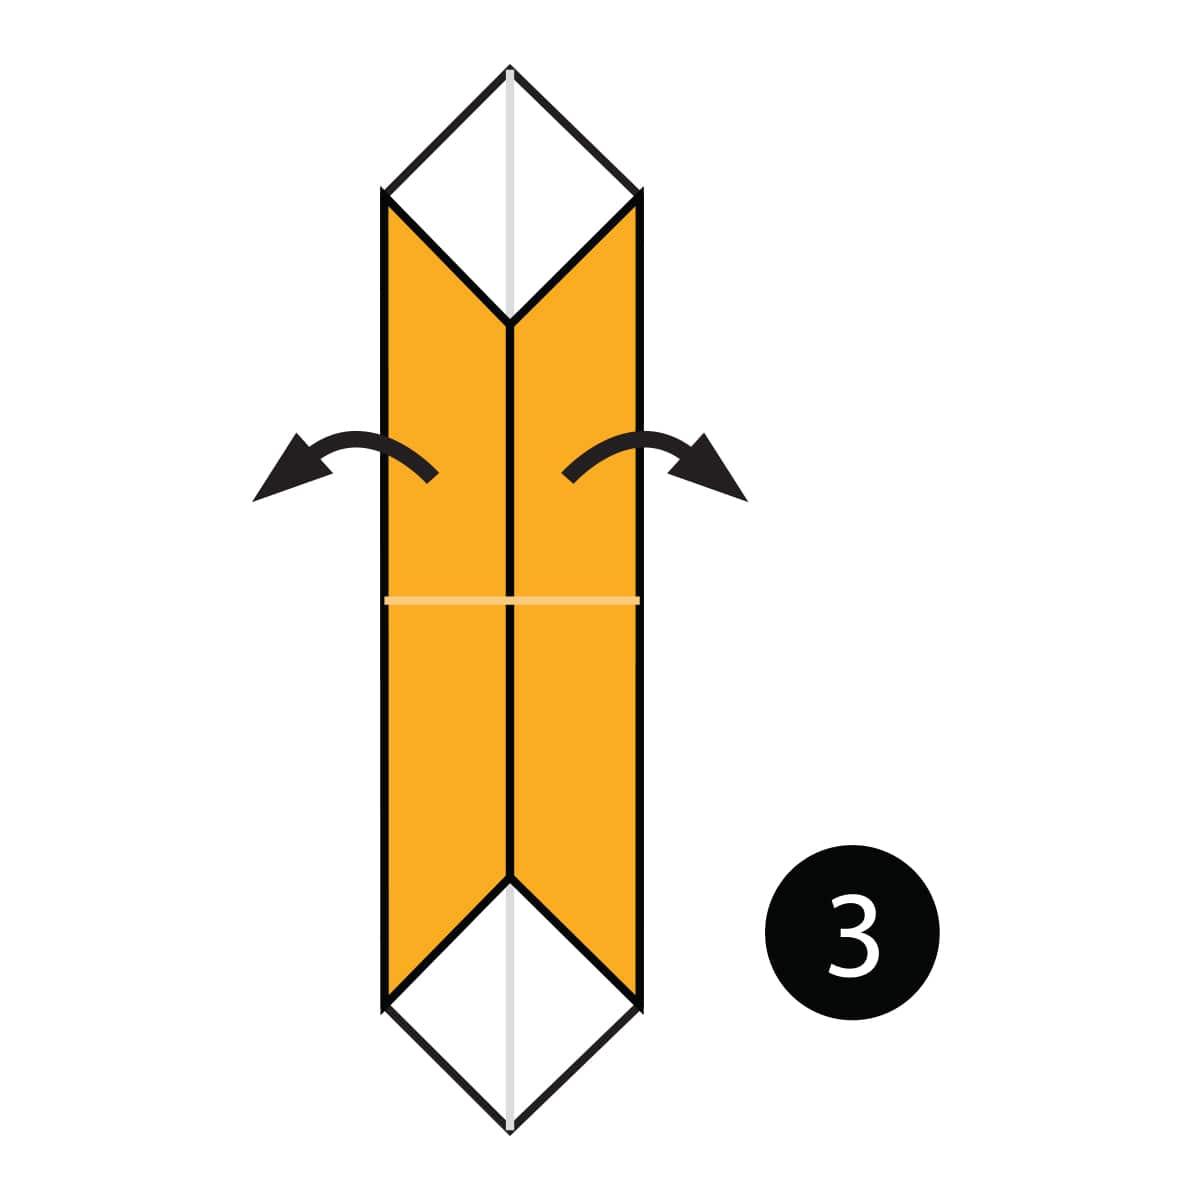 Dachshund Step 3